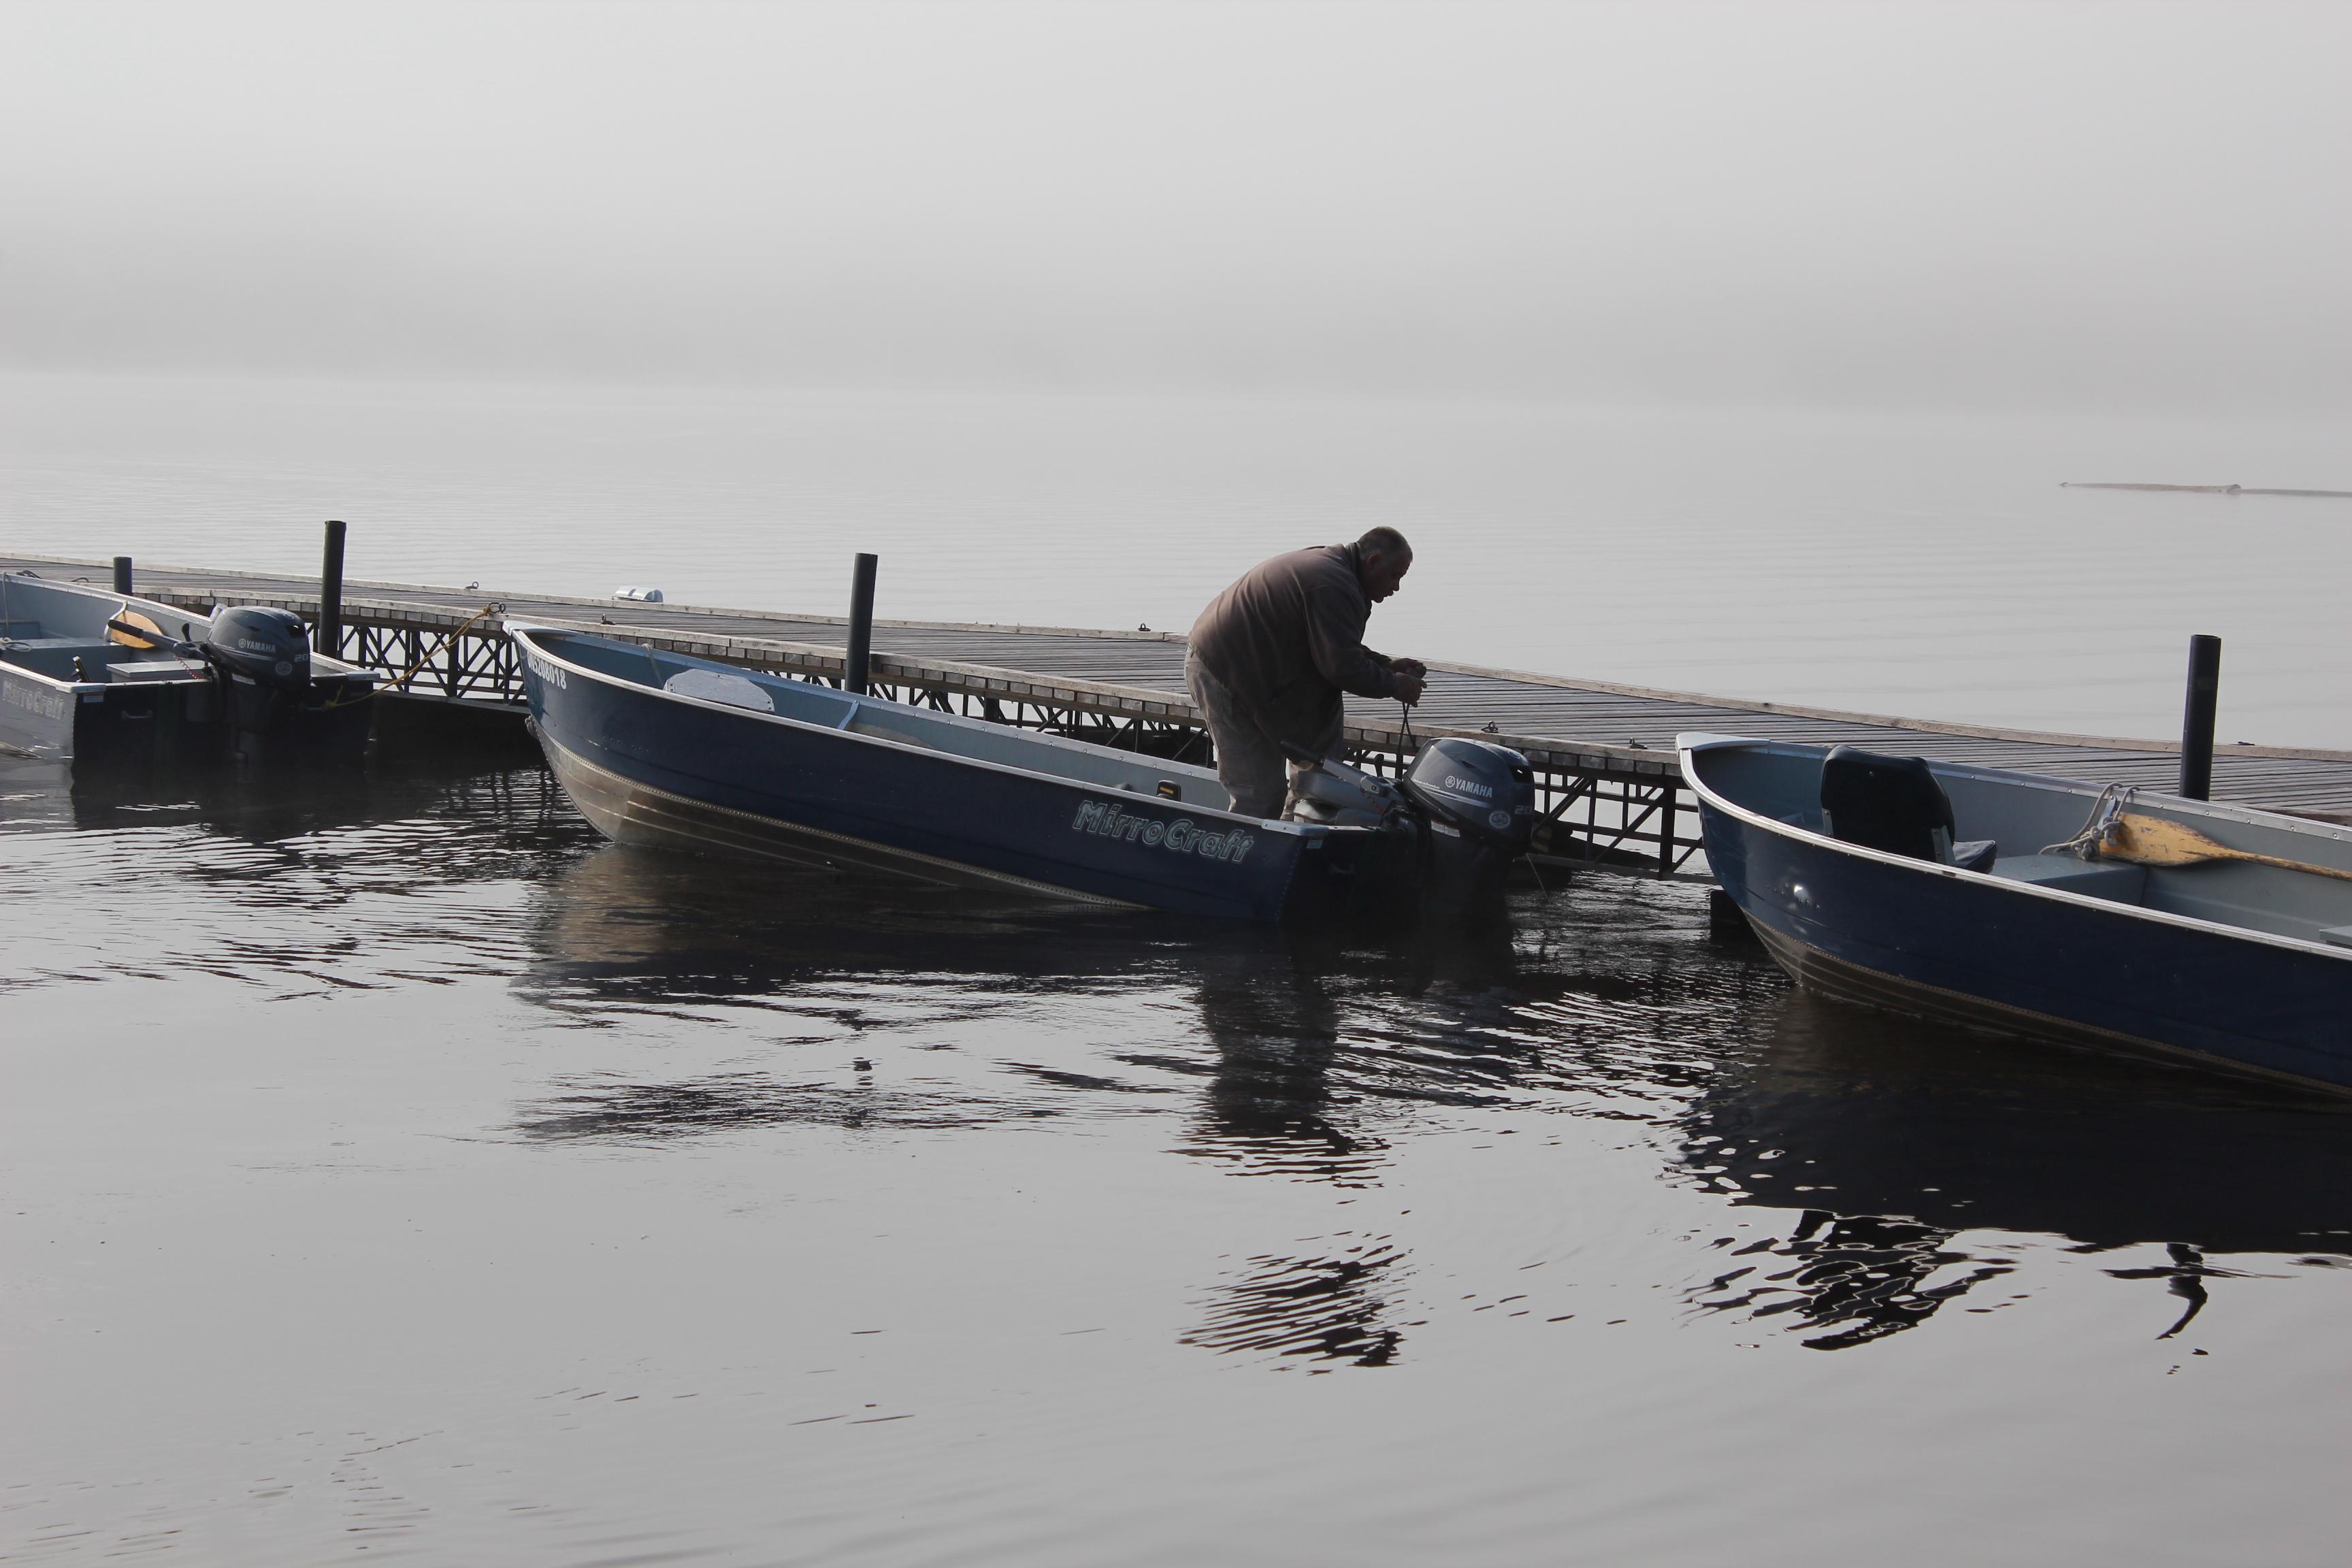 big bear camp's boat fleet